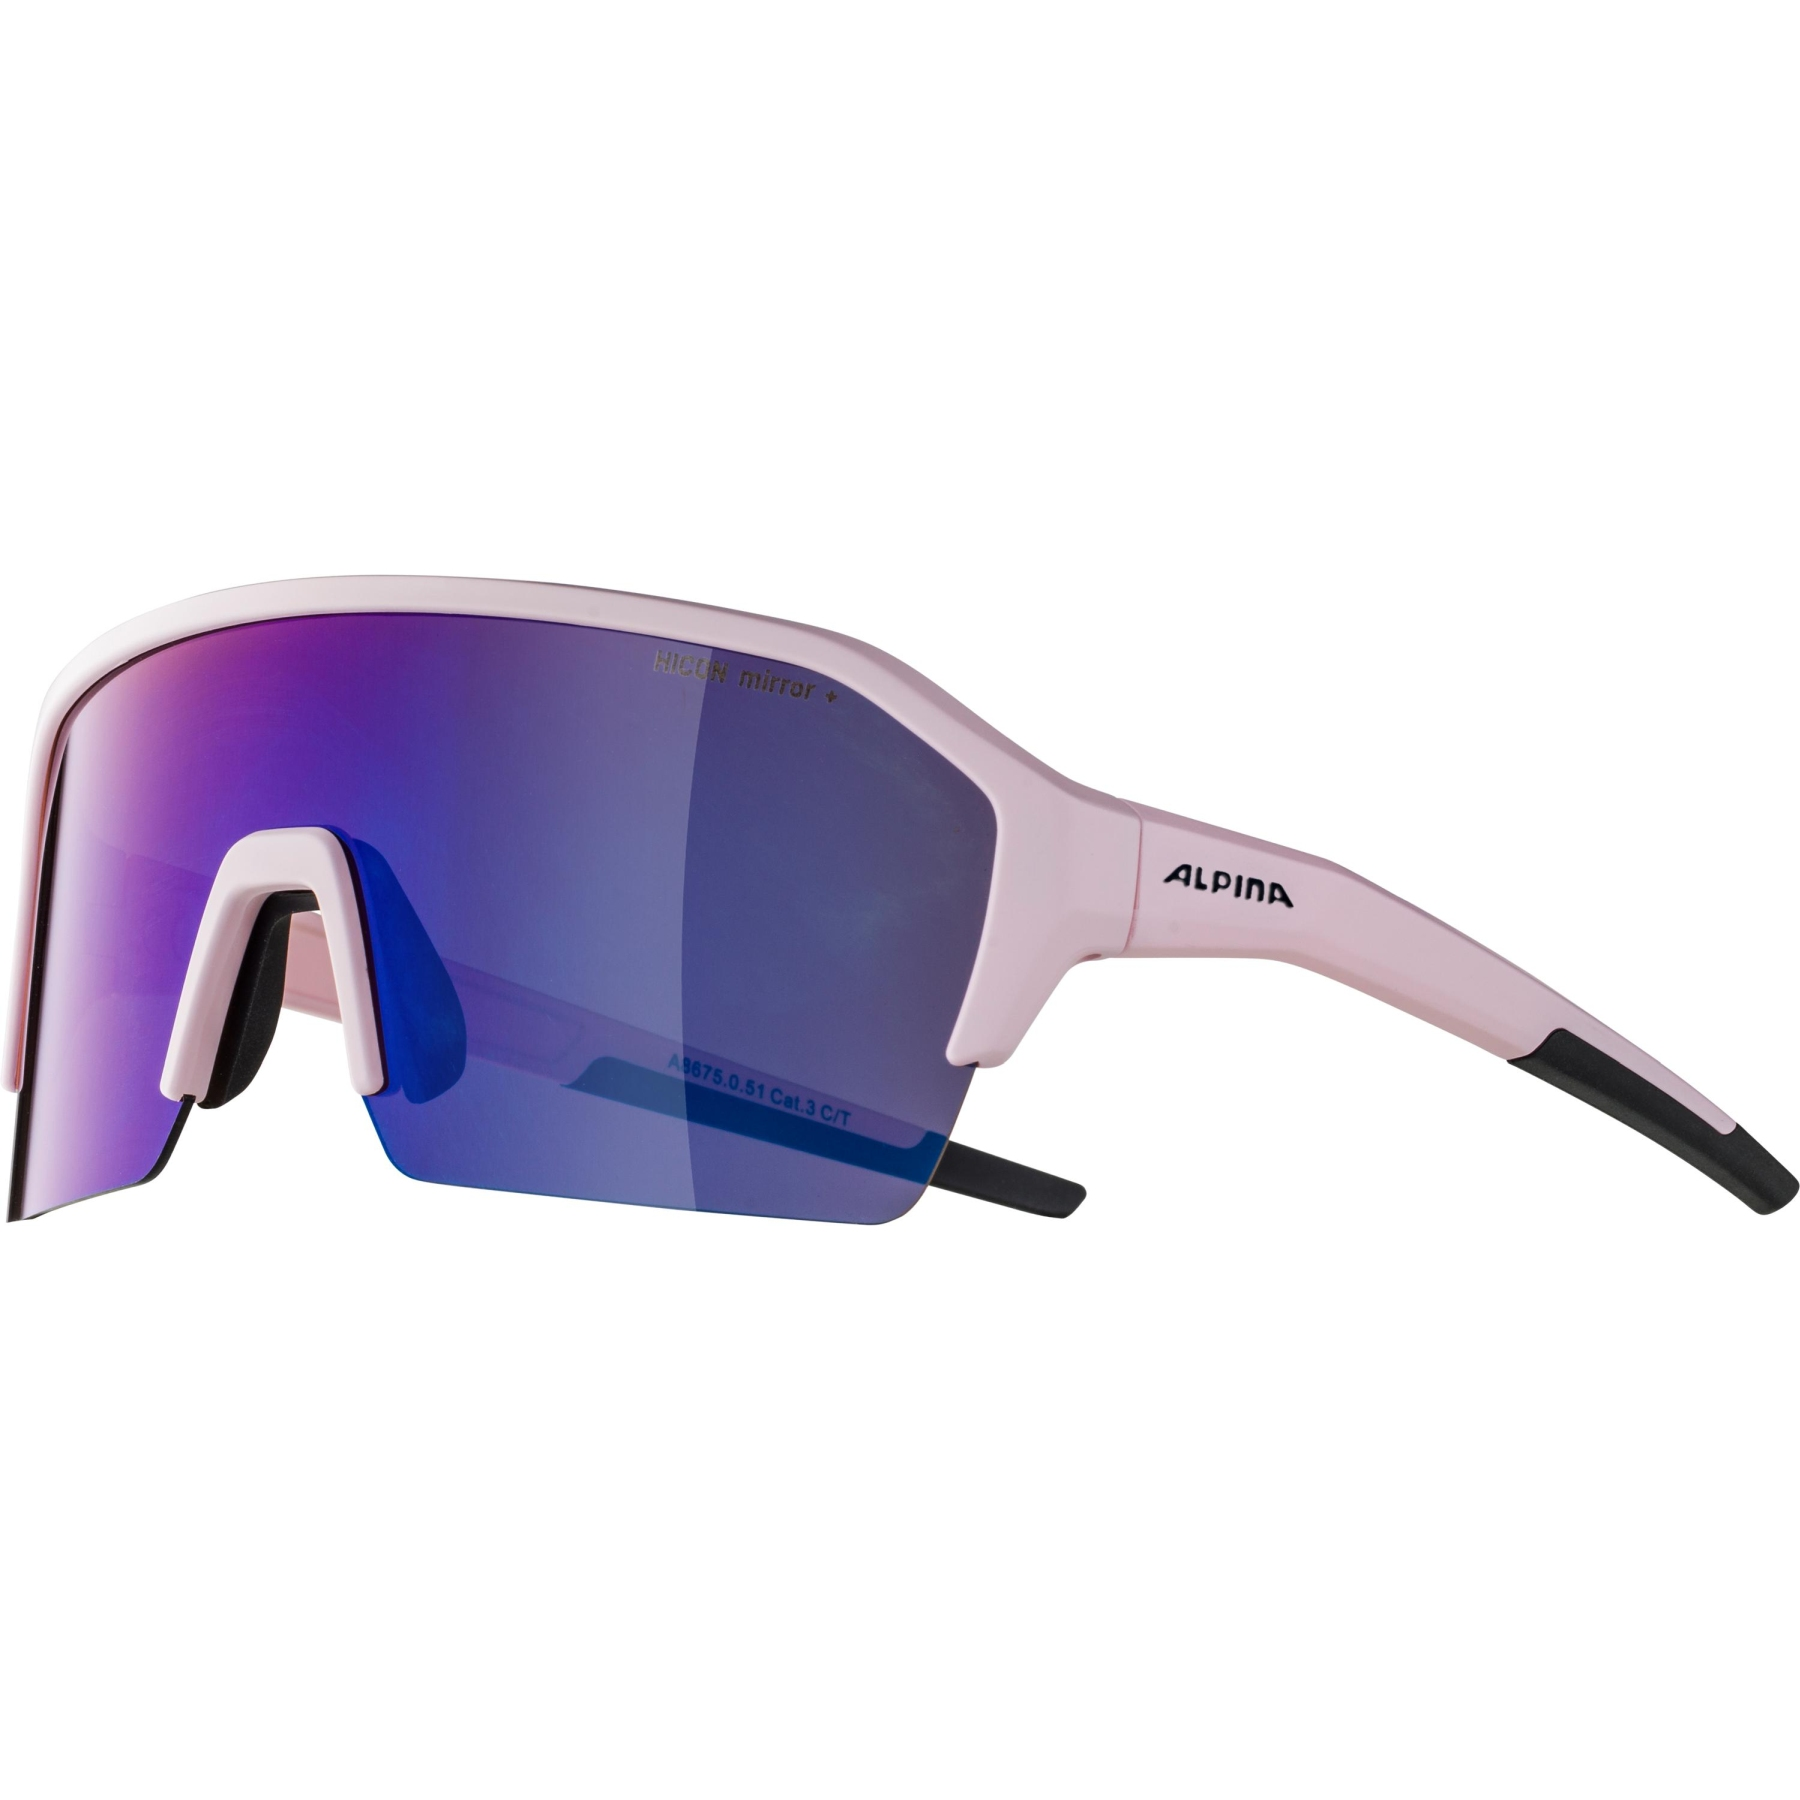 Image of Alpina Ram HR HM+ Glasses - light-rose matt / Hicon blue mirror